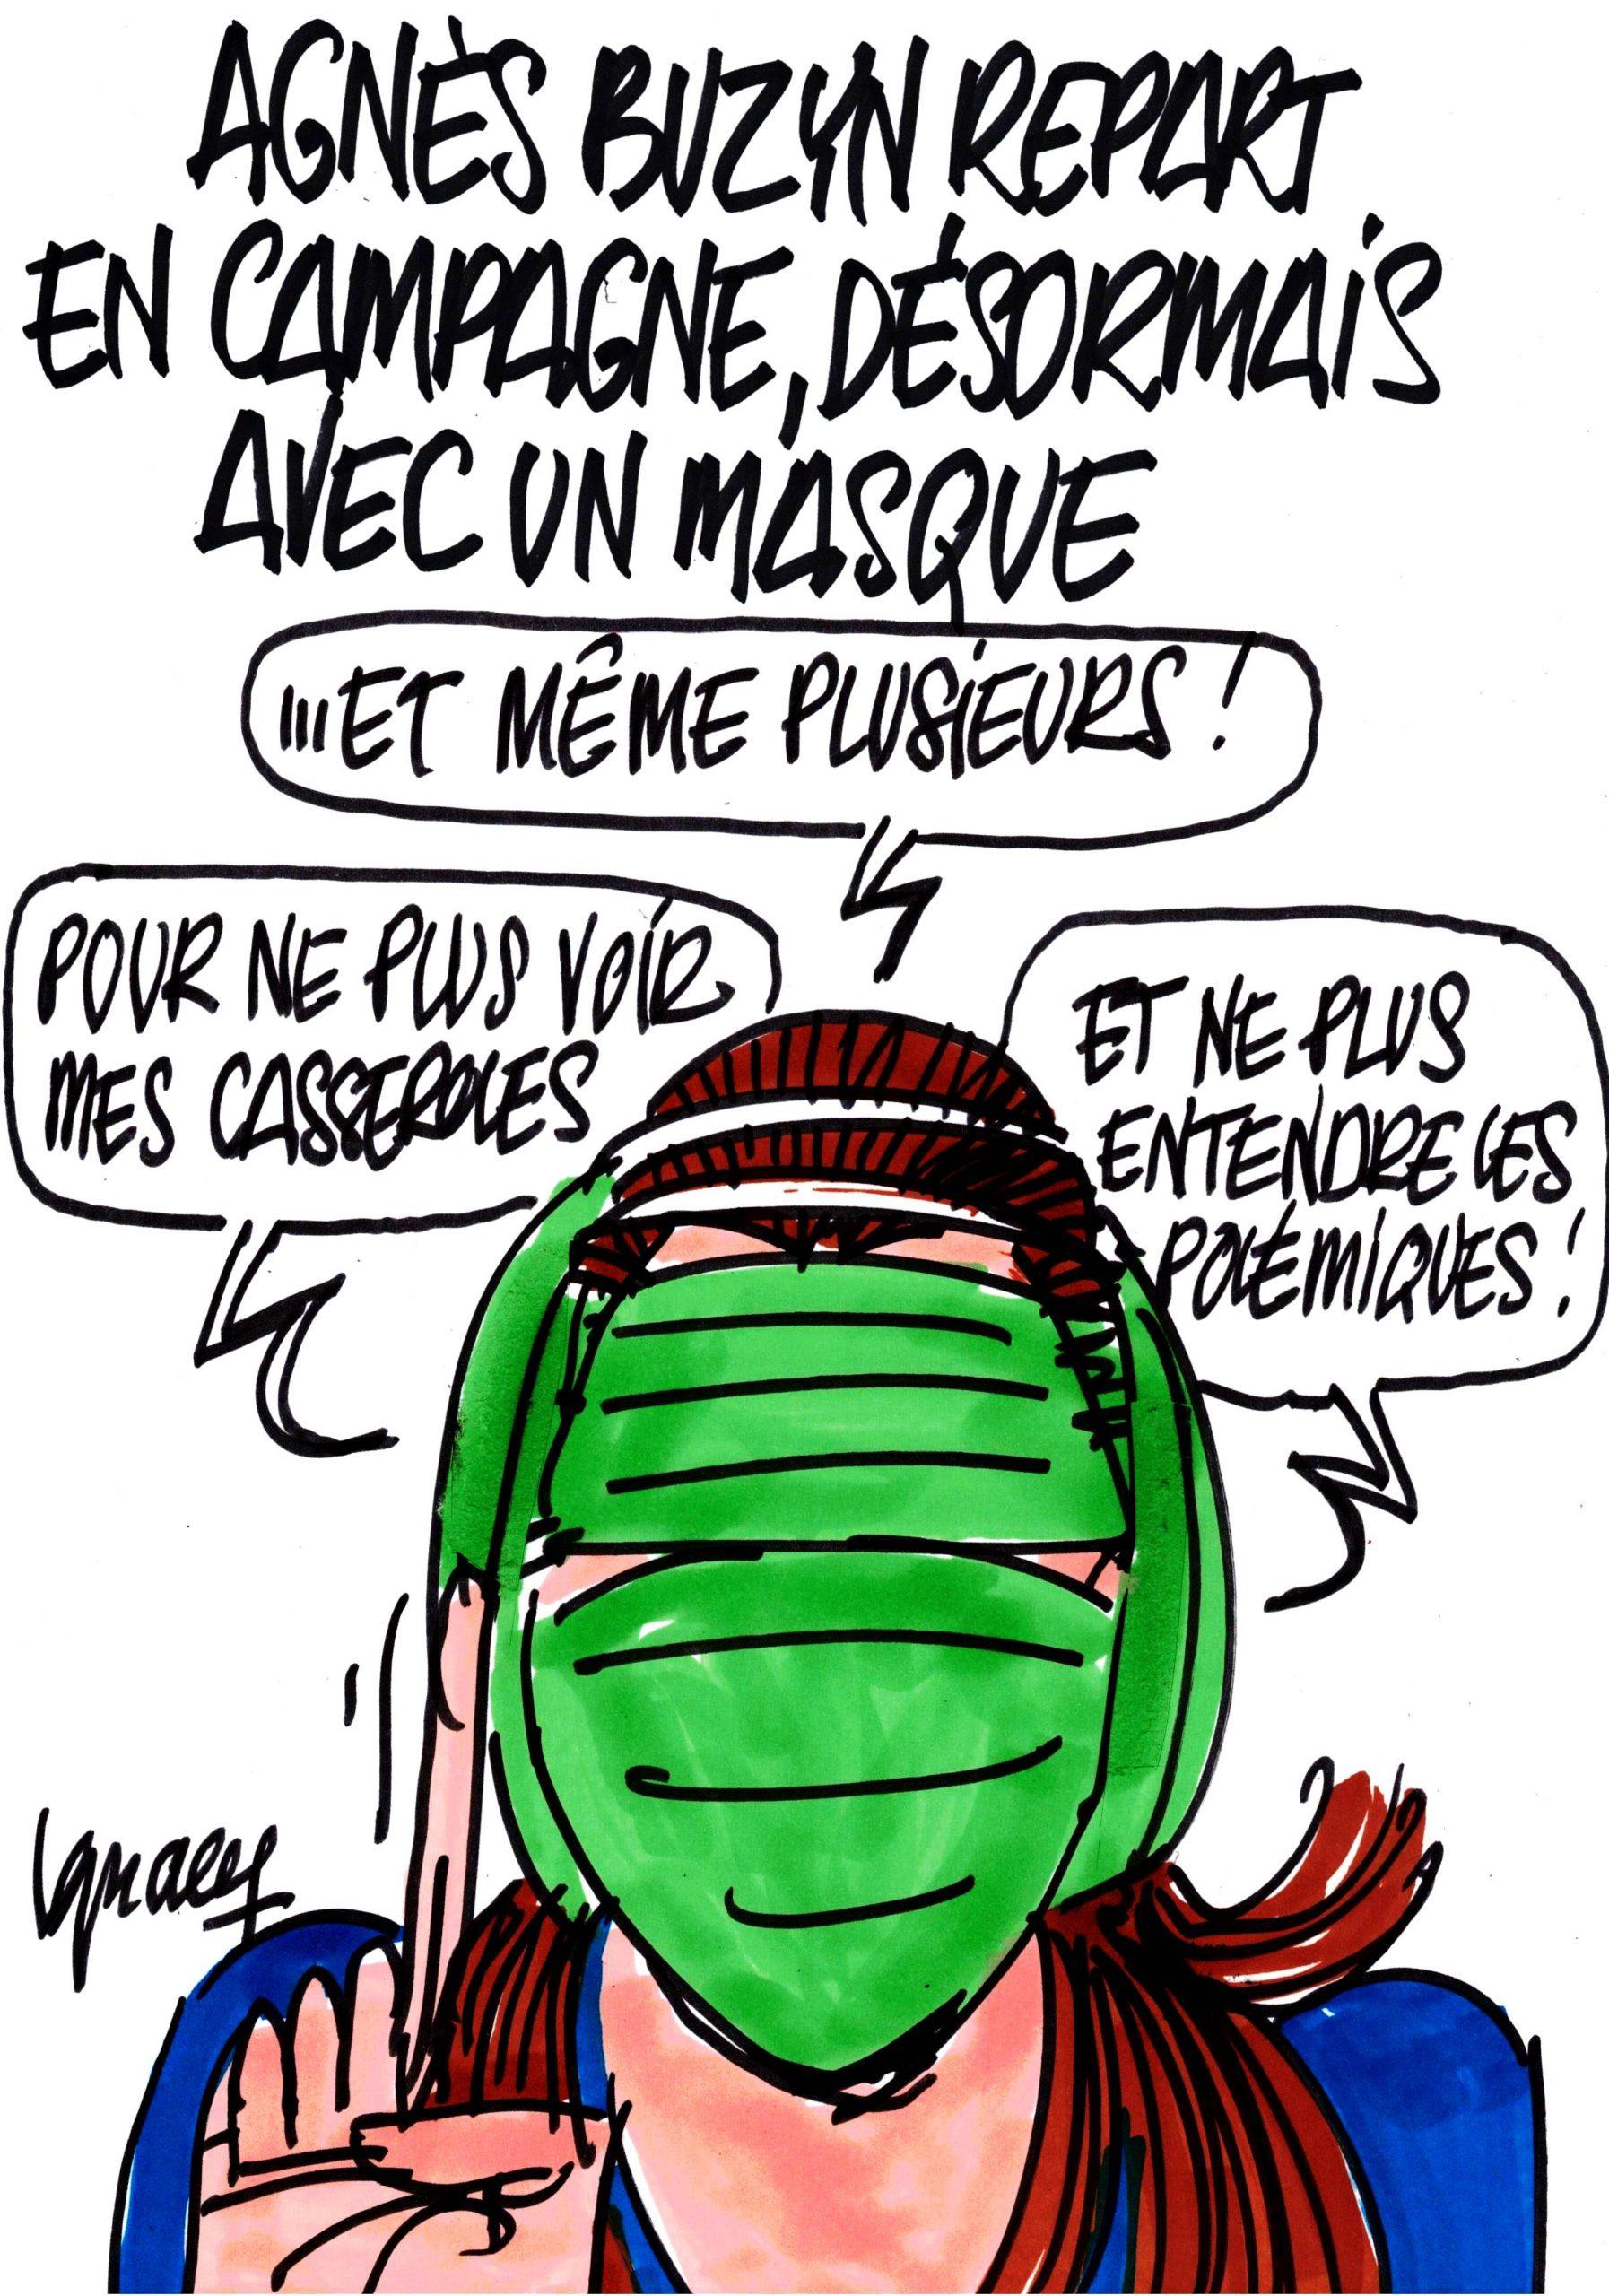 Ignace - Agnès Buzyn repart en campagne